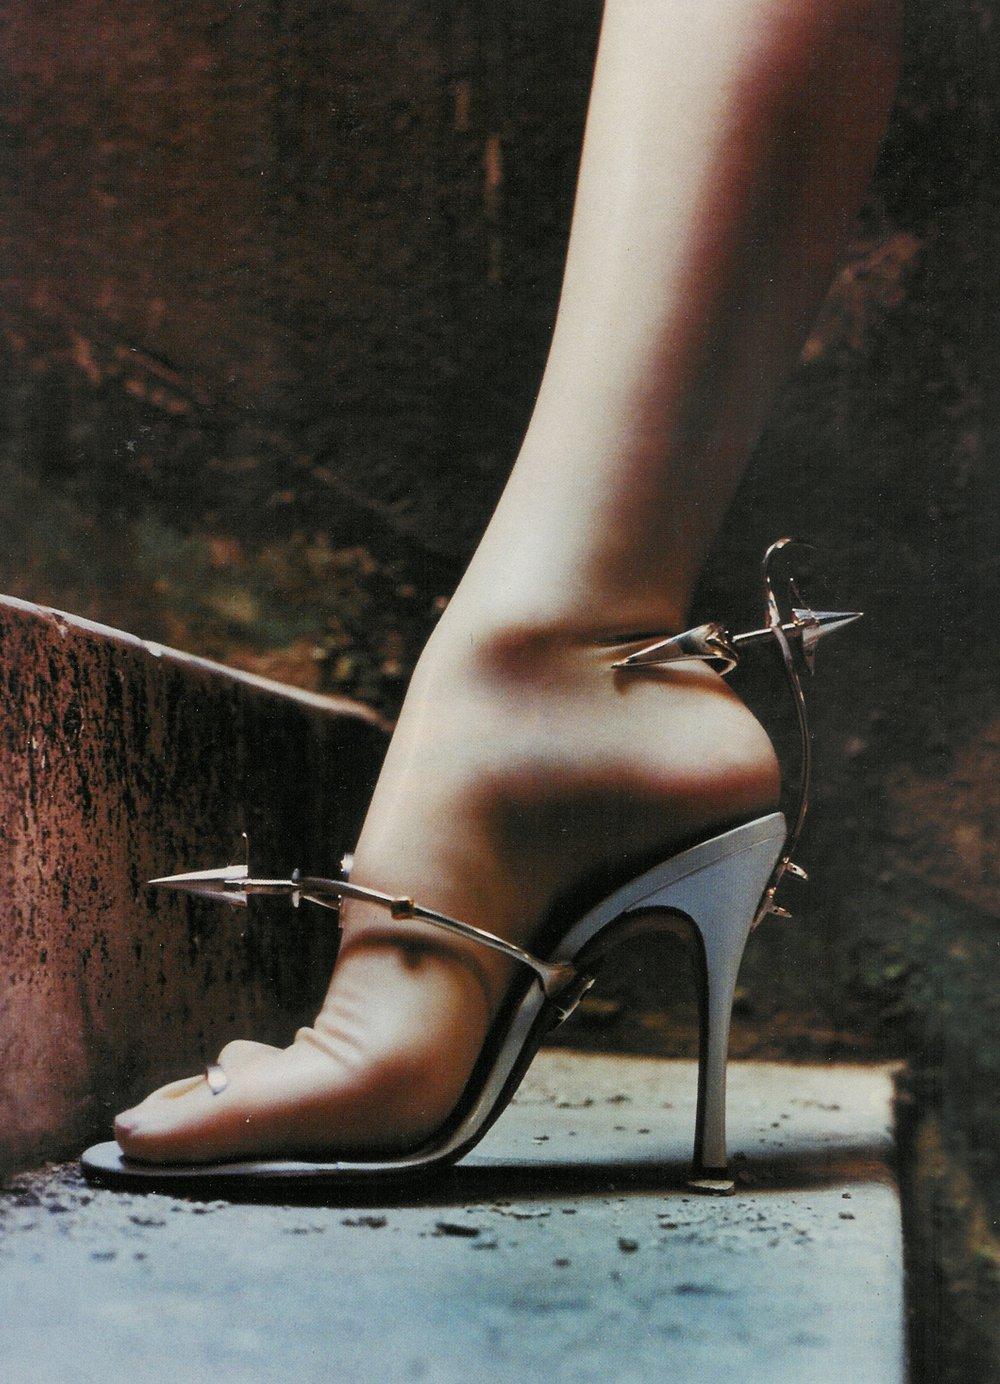 Metal Orthotics Shoe S/S 1999